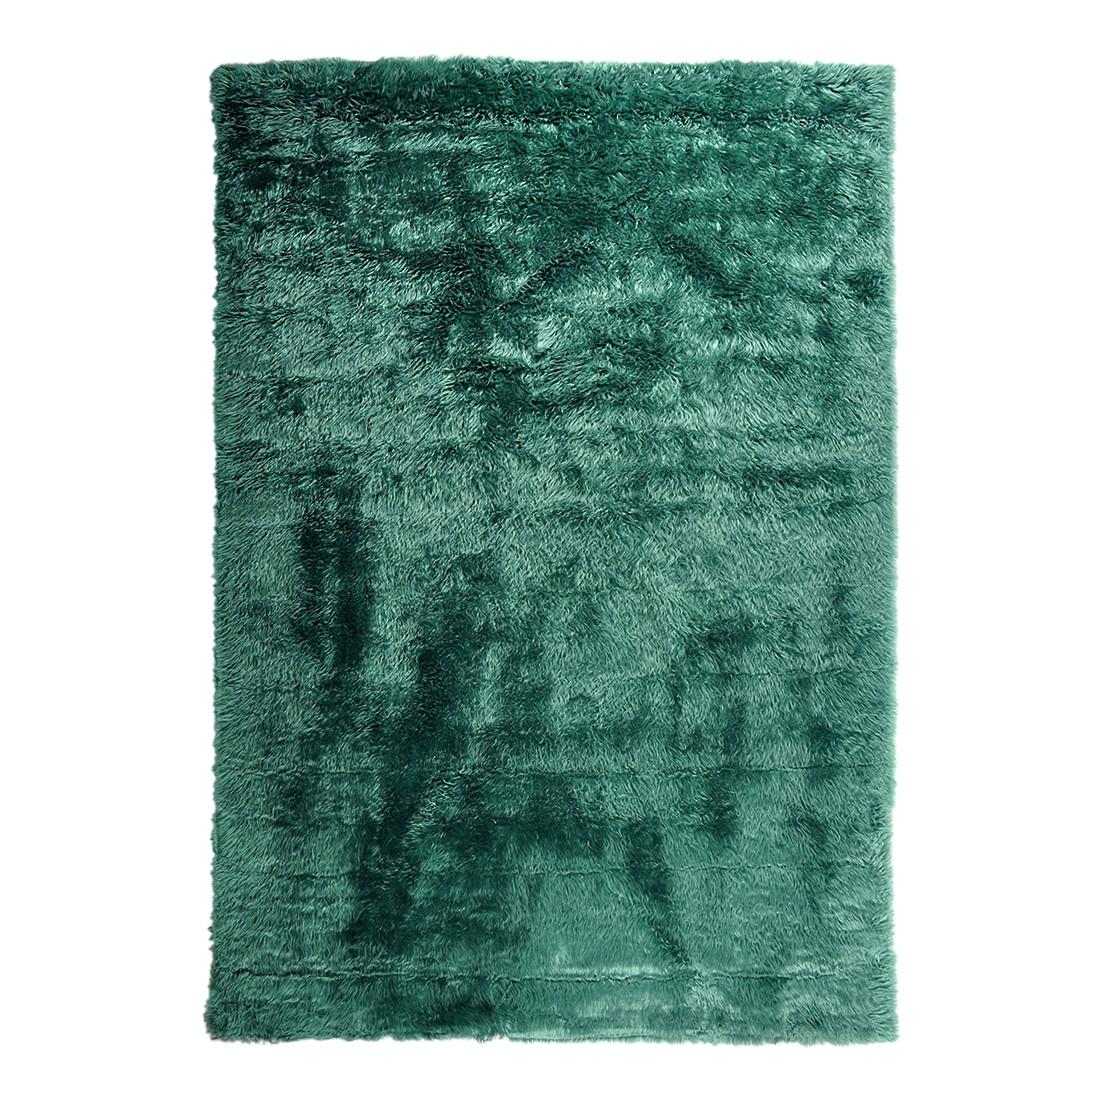 Teppich Cuneco II – Grün – 160 x 230 cm, Hanse Home Collection günstig bestellen